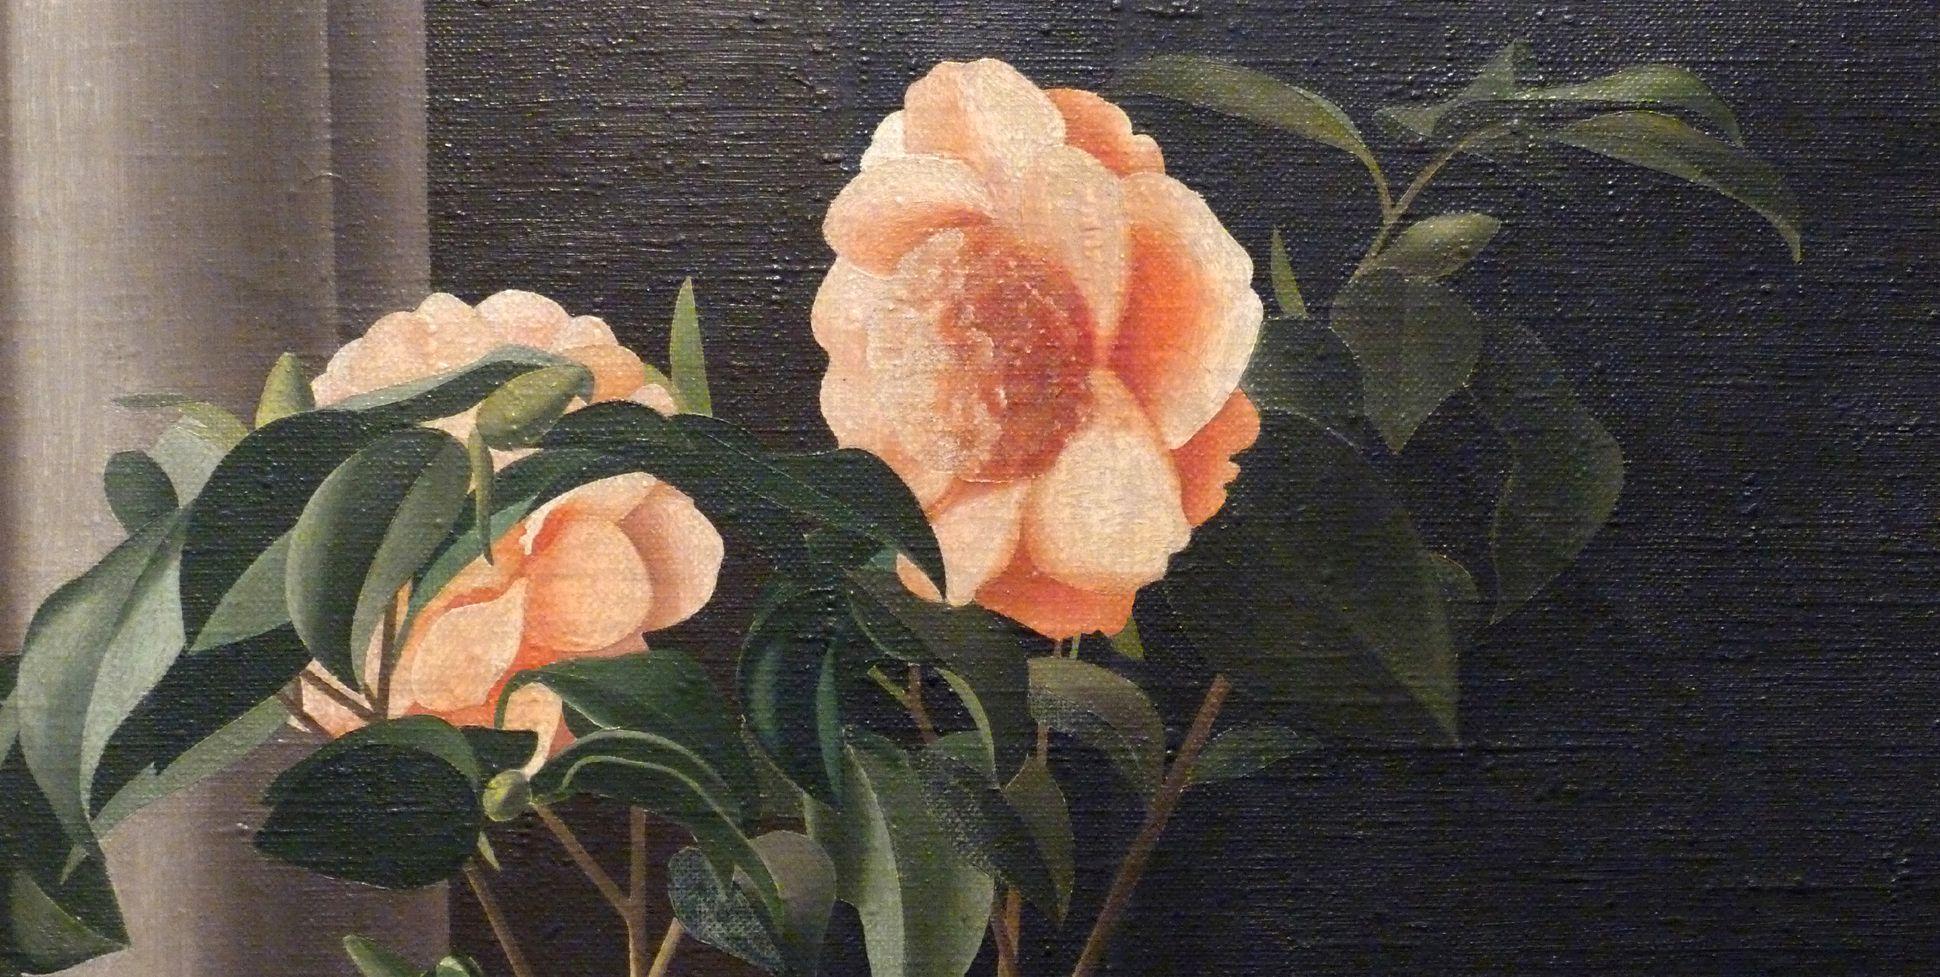 Blumenstock, Kamelie Detail, Blüten